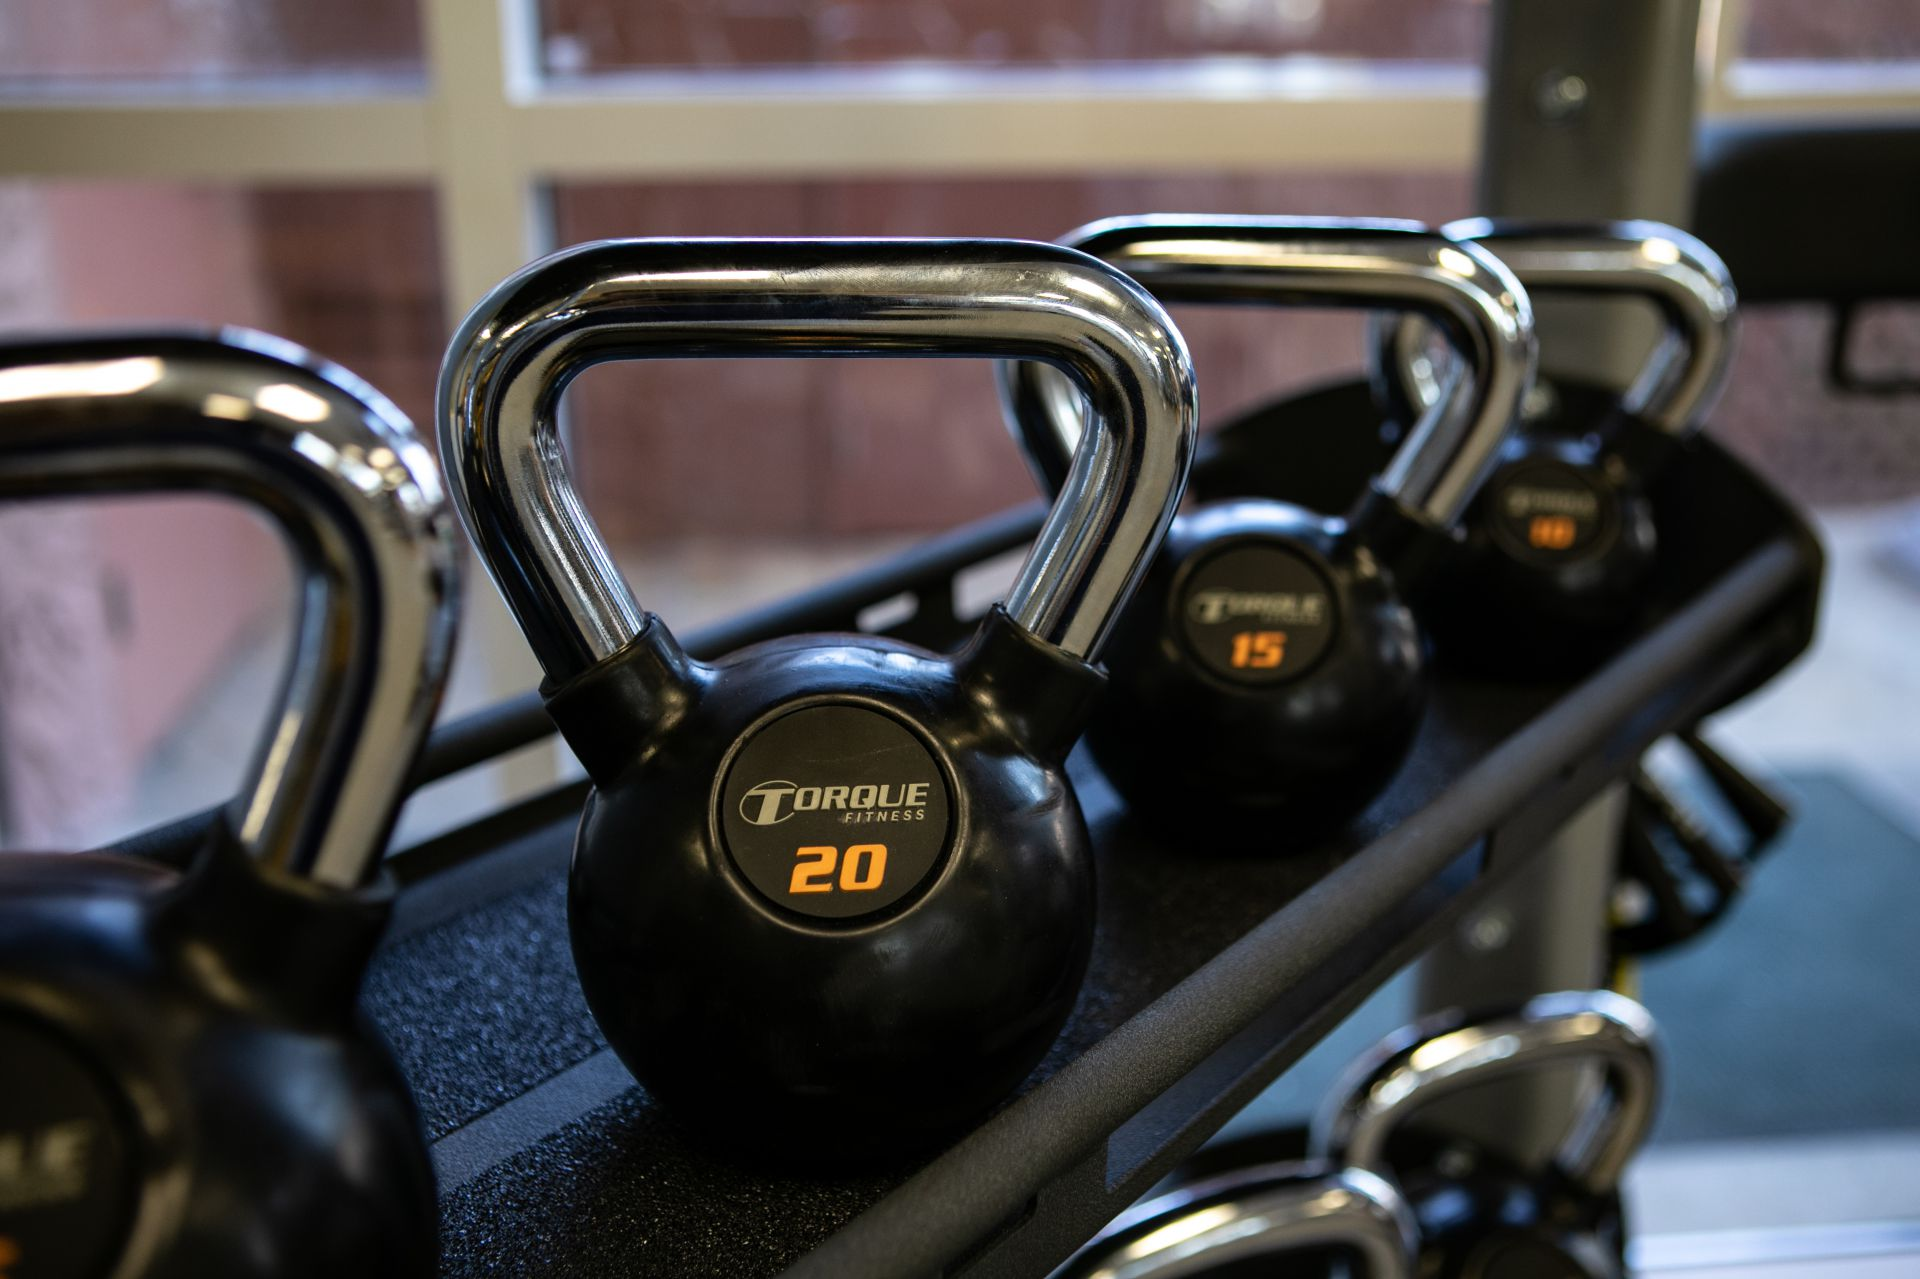 Torque Fitness dumbells